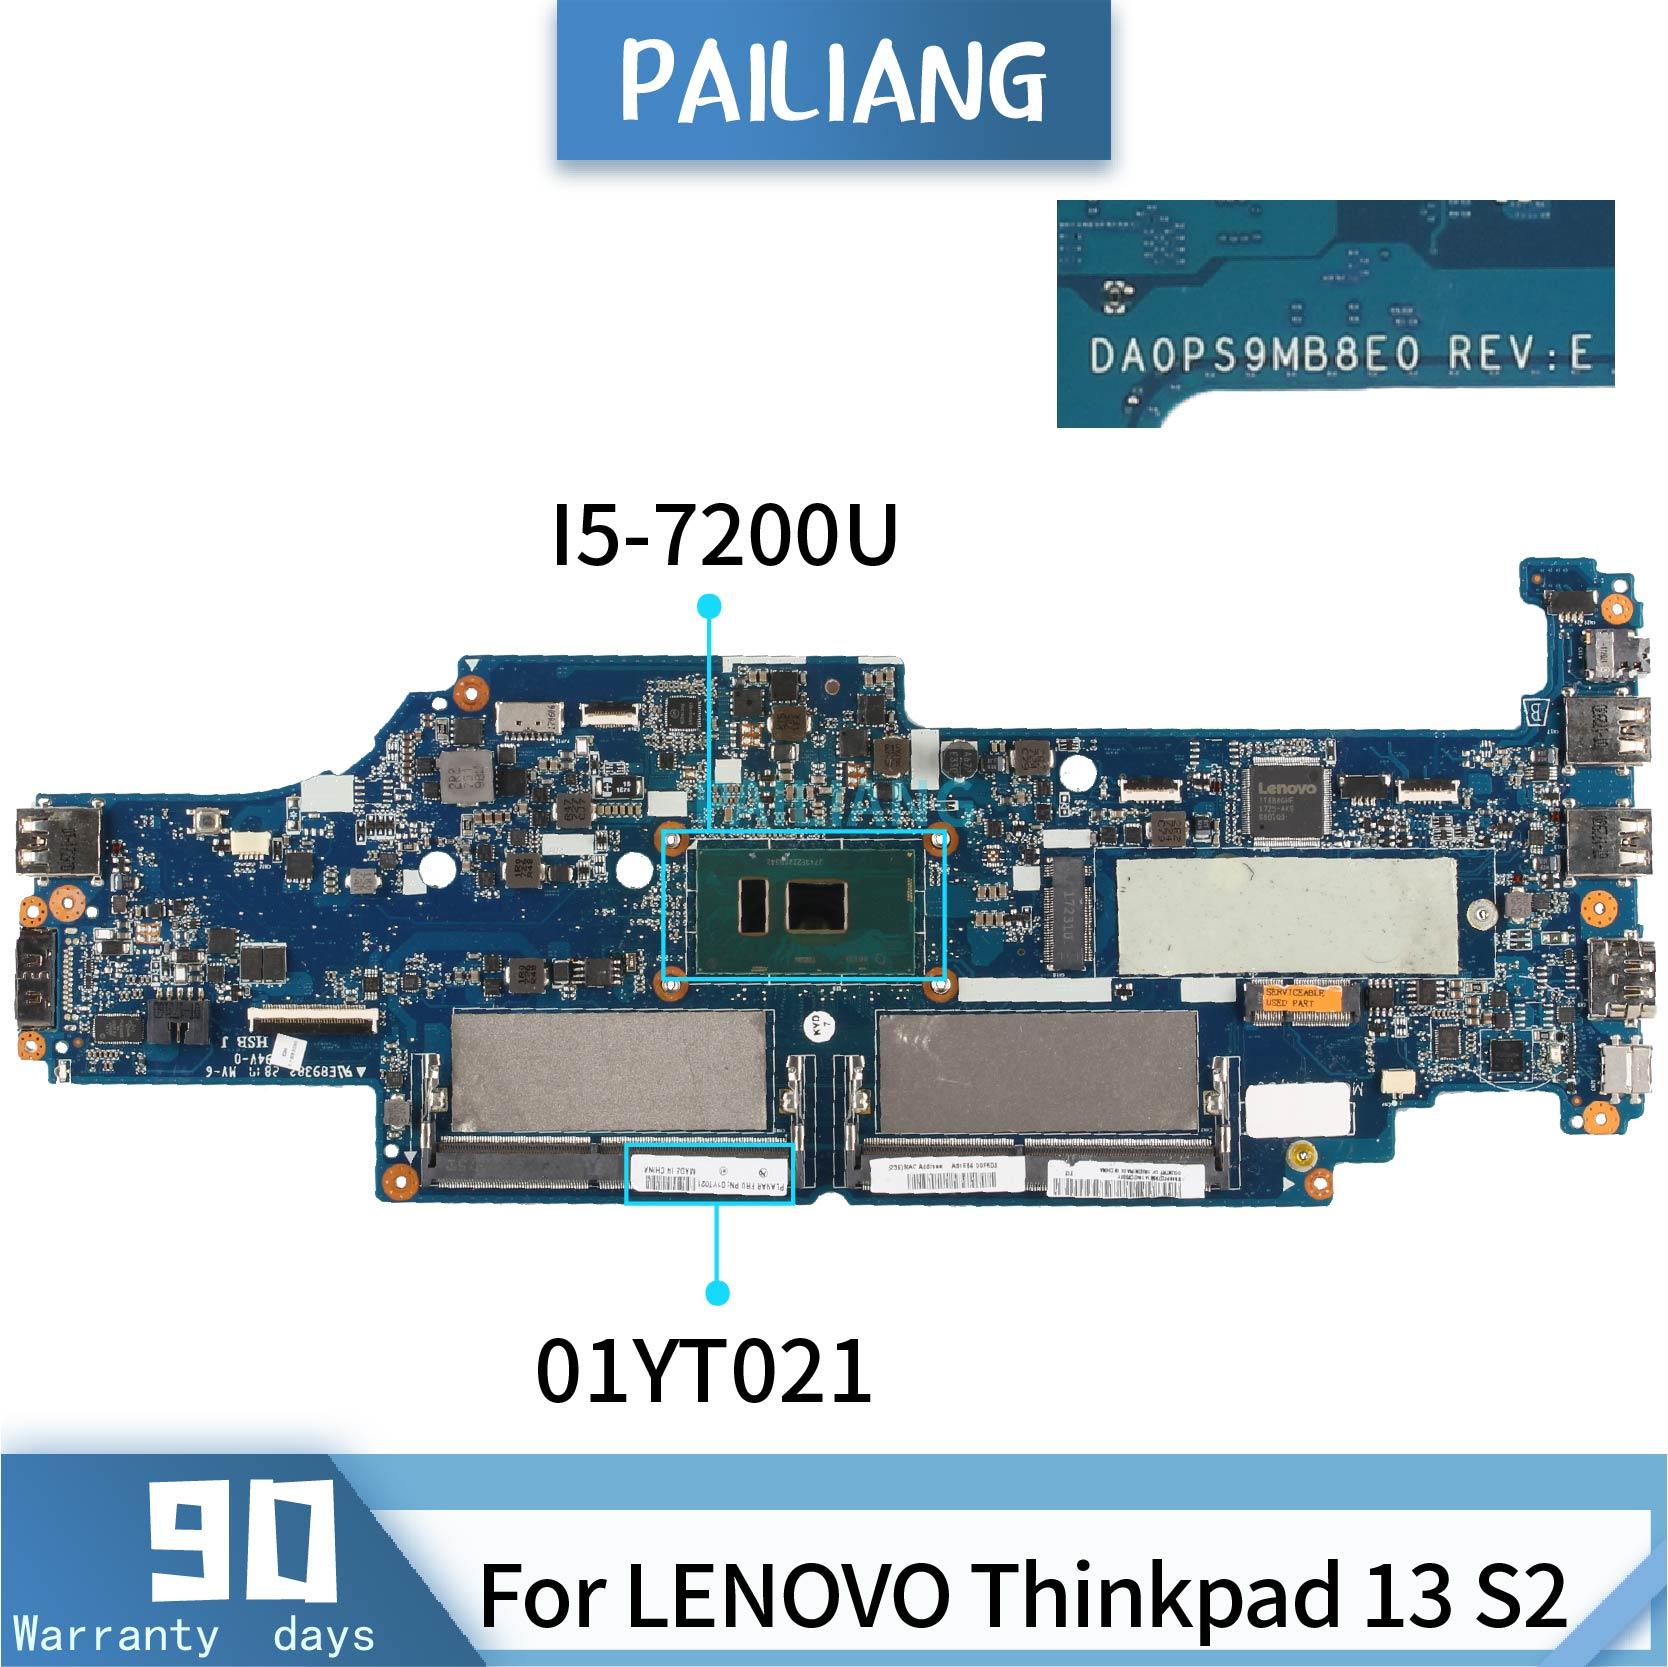 PAILIANG اللوحة لابتوب لينوفو ثينك باد 13 S2 DA0PS9MB8E0 01YT021 اللوحة النواة SR342 I5-7200U اختبار DDR3